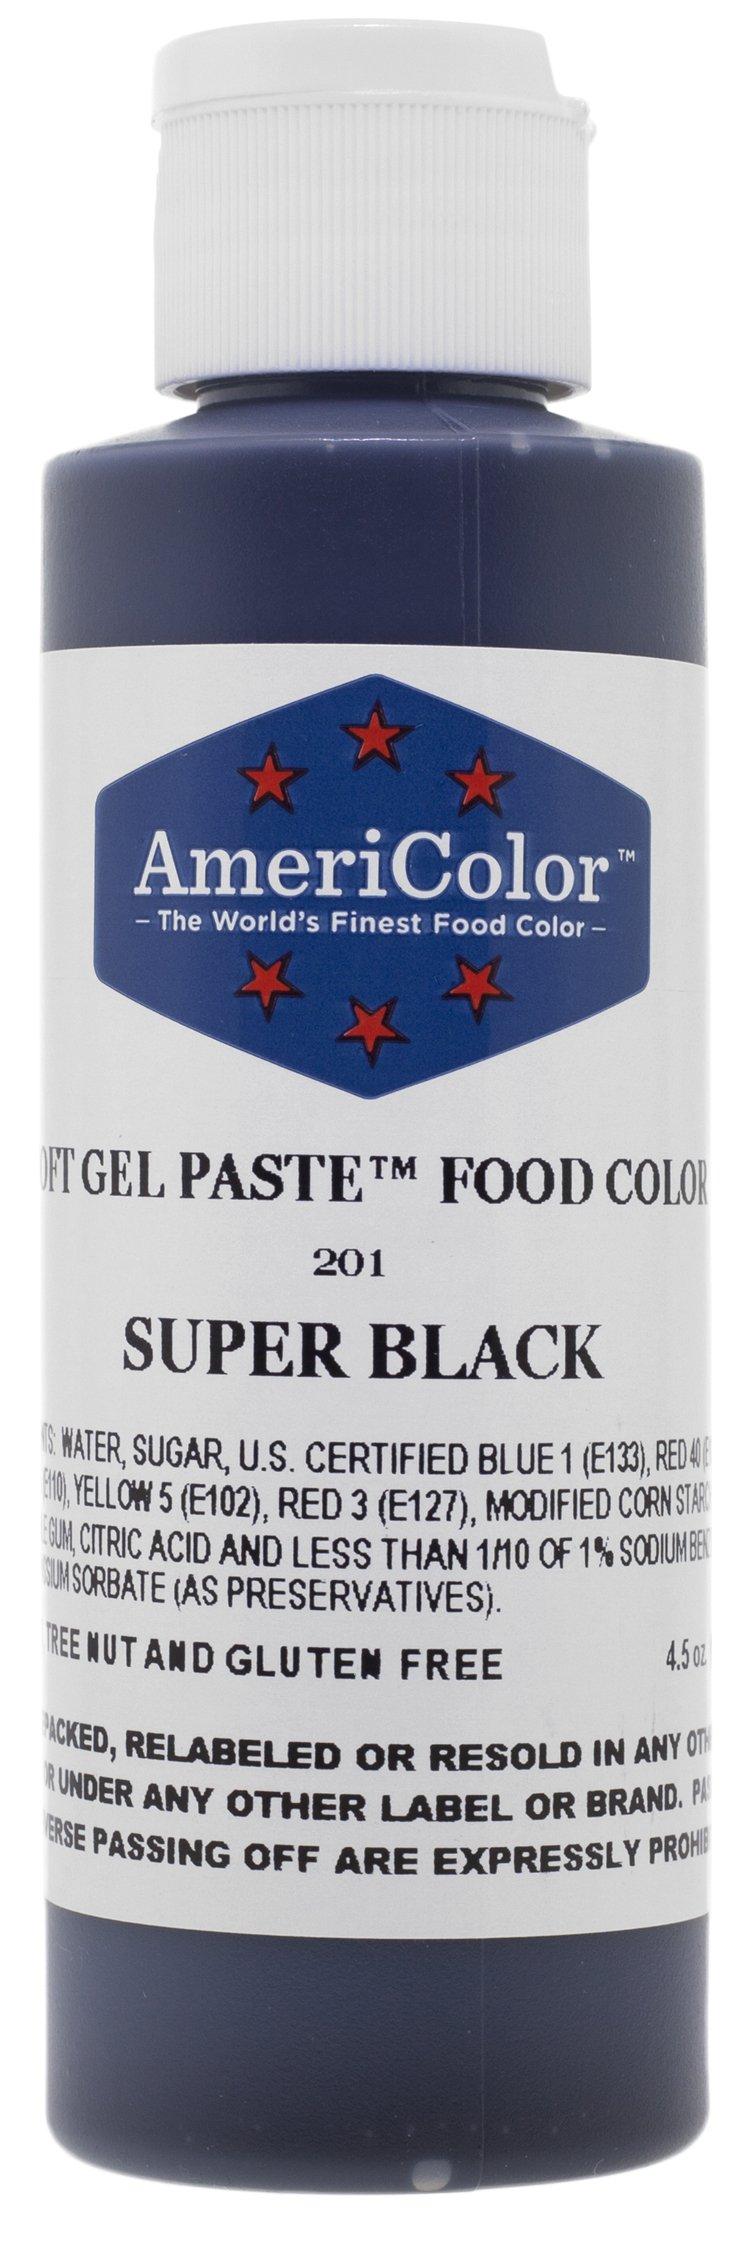 Food Coloring AmeriColor - Super Black Soft Gel Paste, 4.5 Ounce